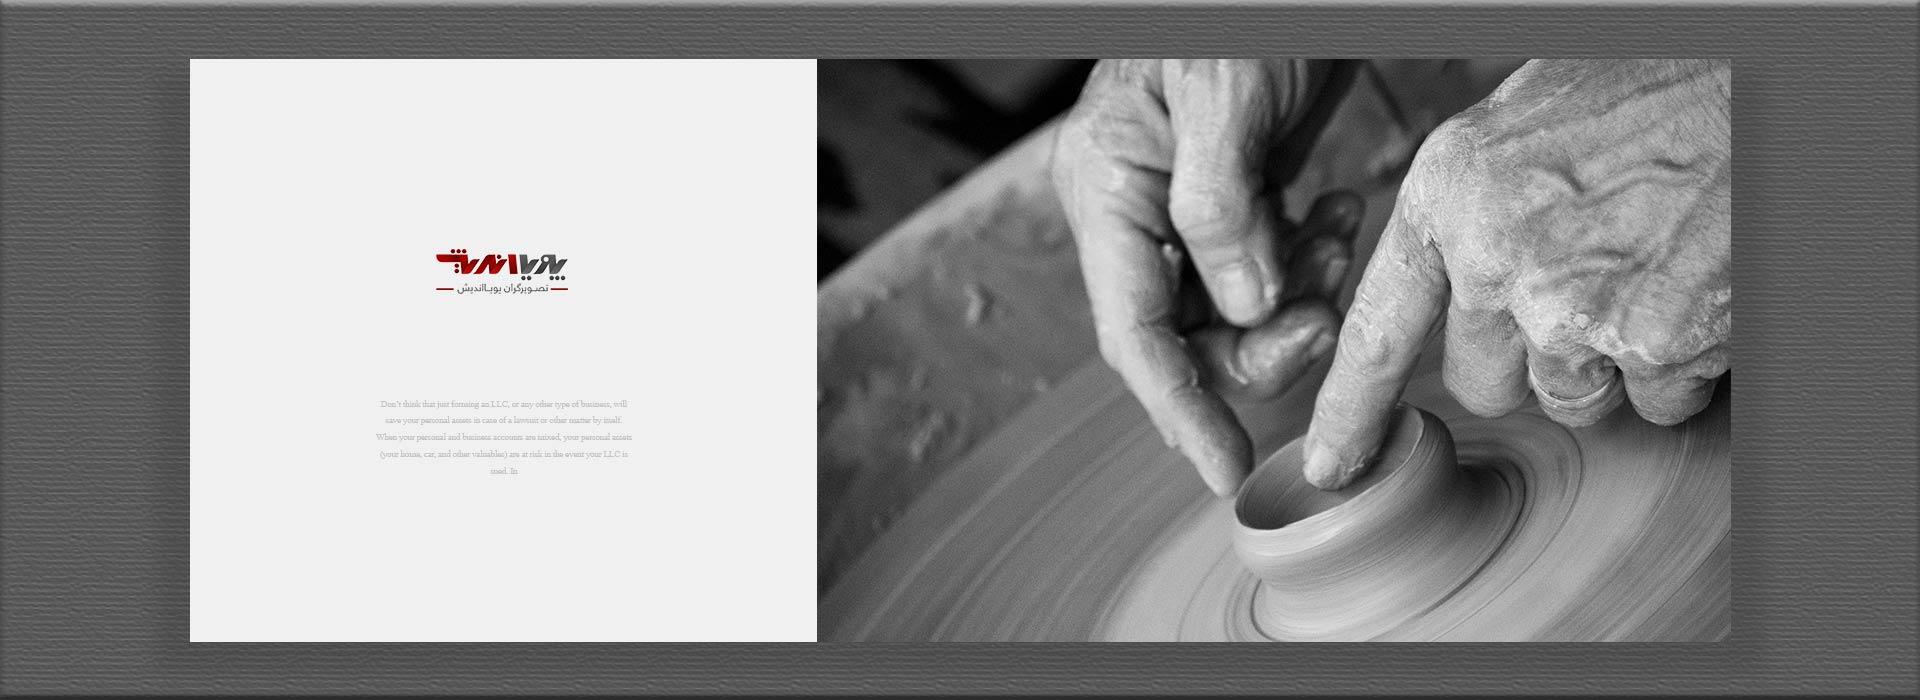 pottery - چگونه کسب و کار سفالگری راه اندازی کنیم ؟